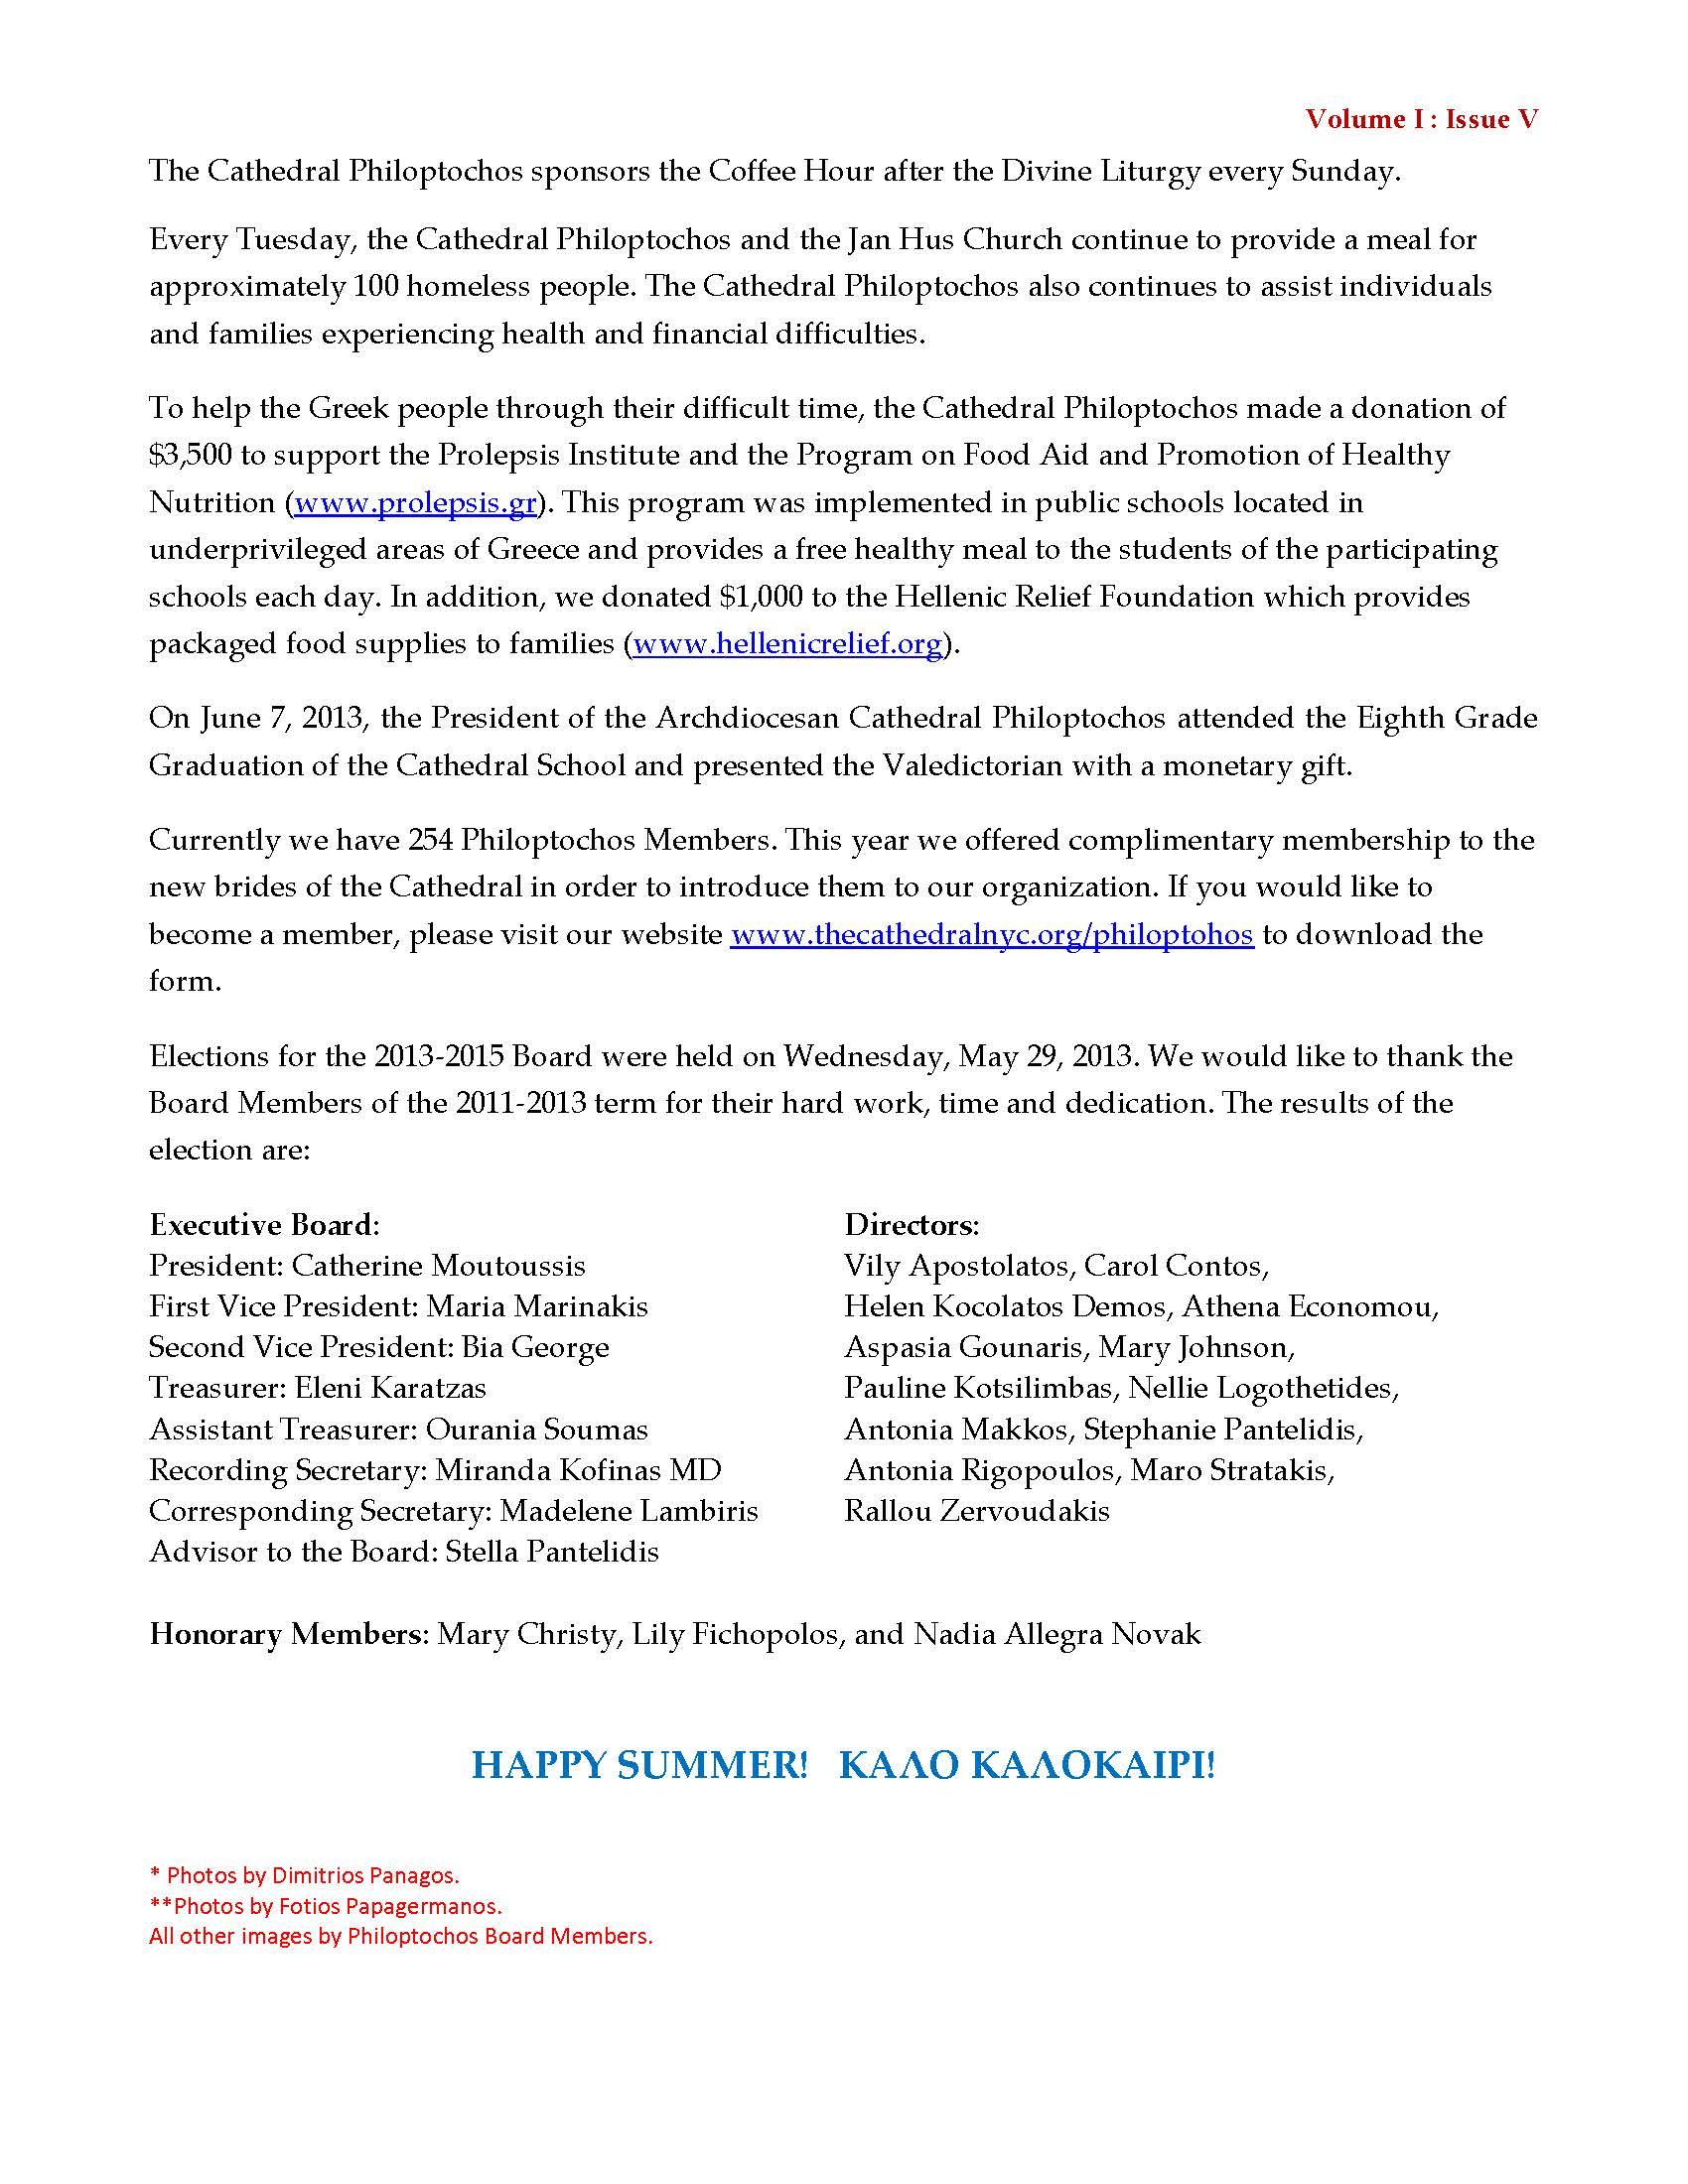 F - Spring-Summer 2013 Newsletter_Page_3.jpg